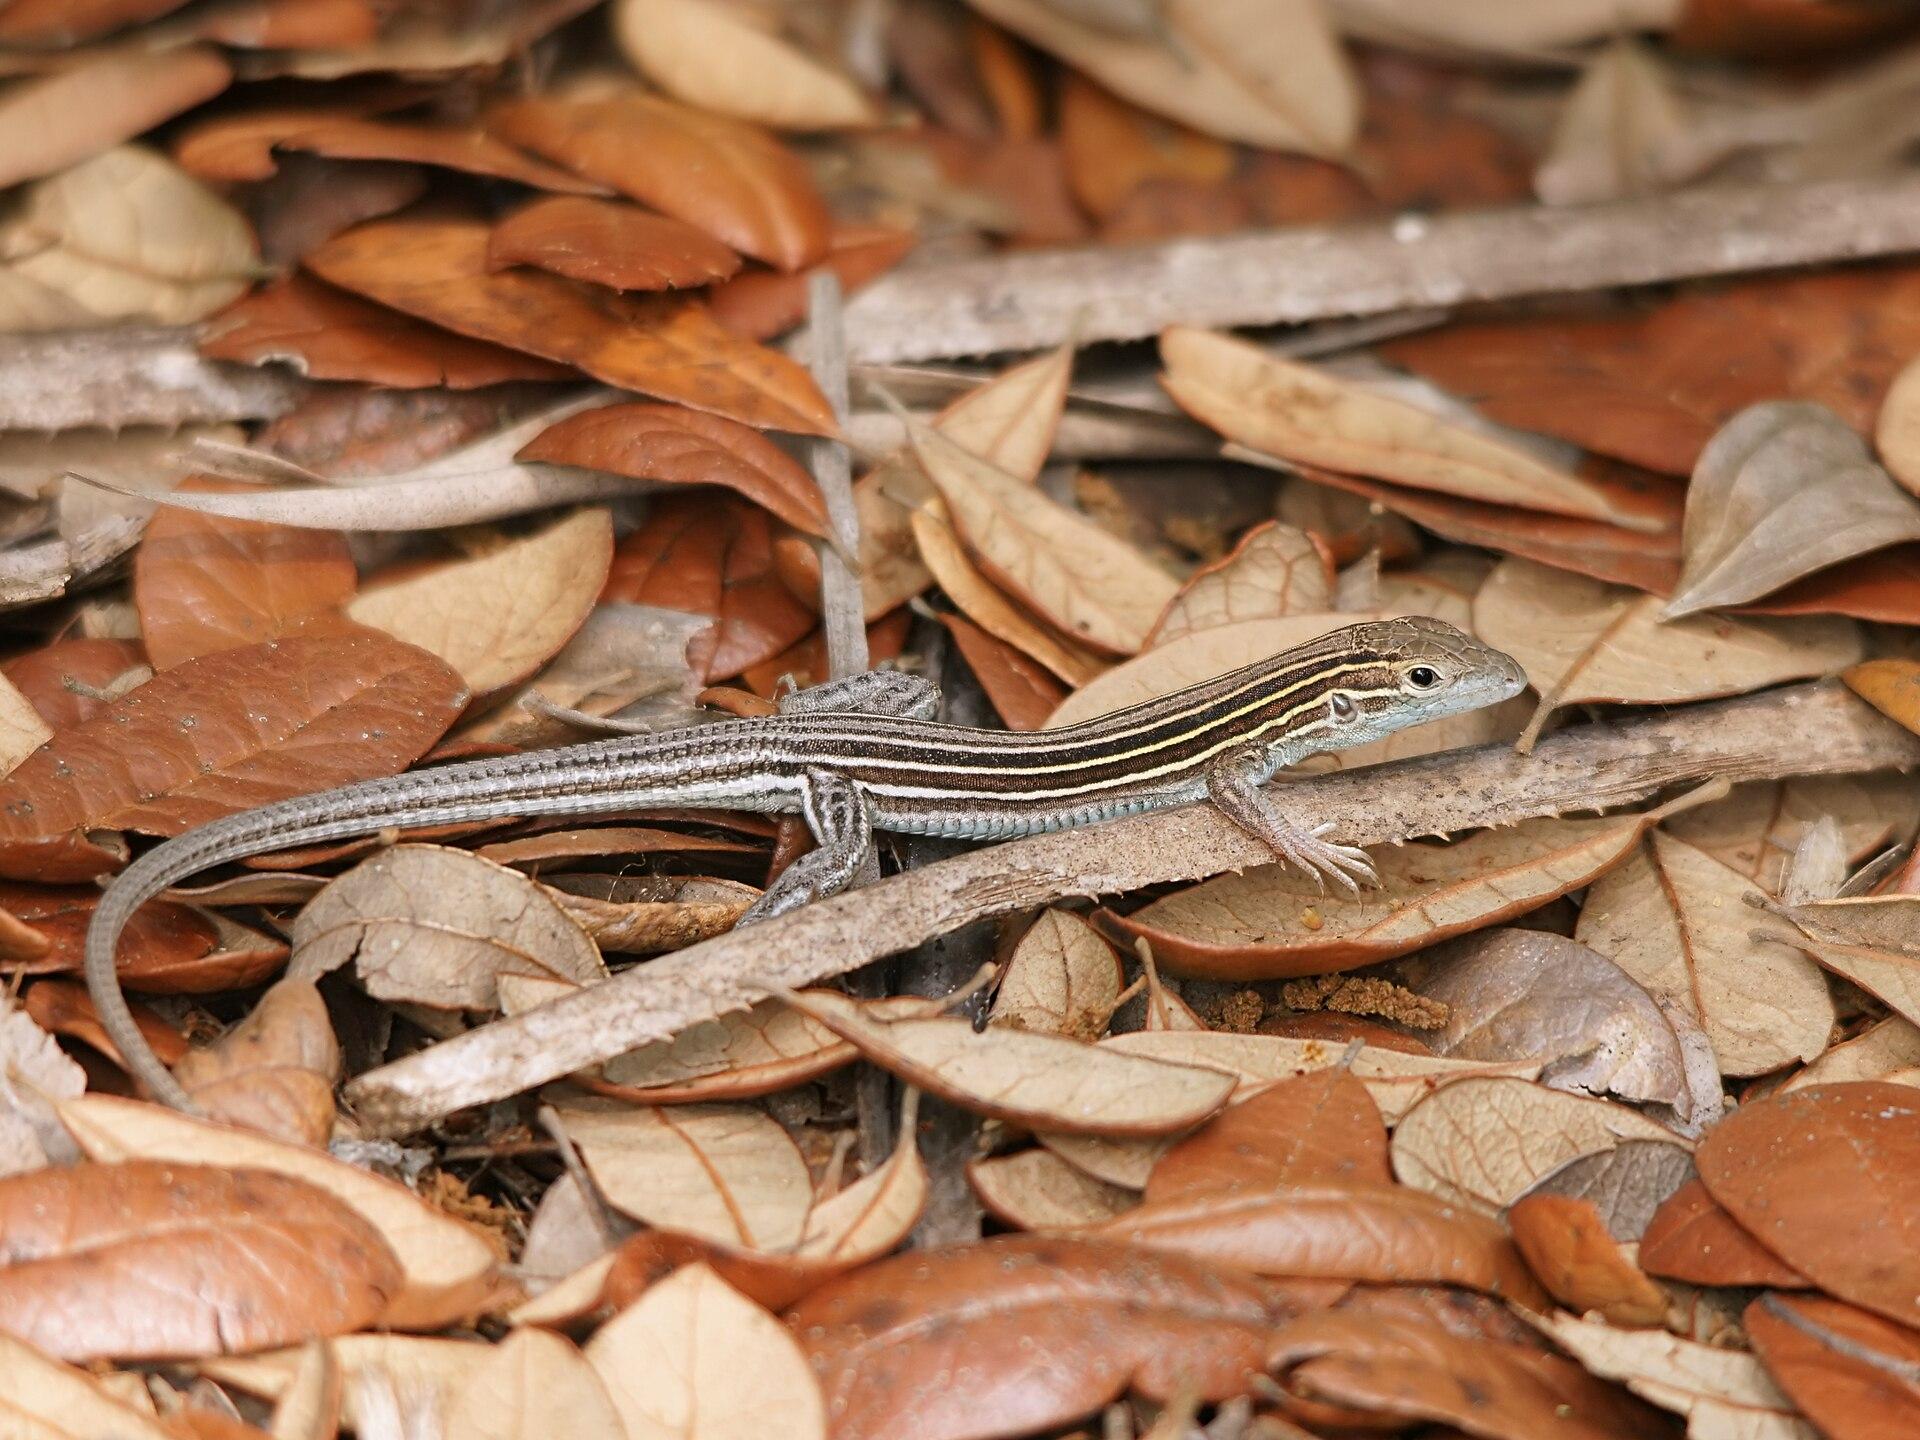 Six-Lined Racerunner (Aspidoscelis sexlineatus)